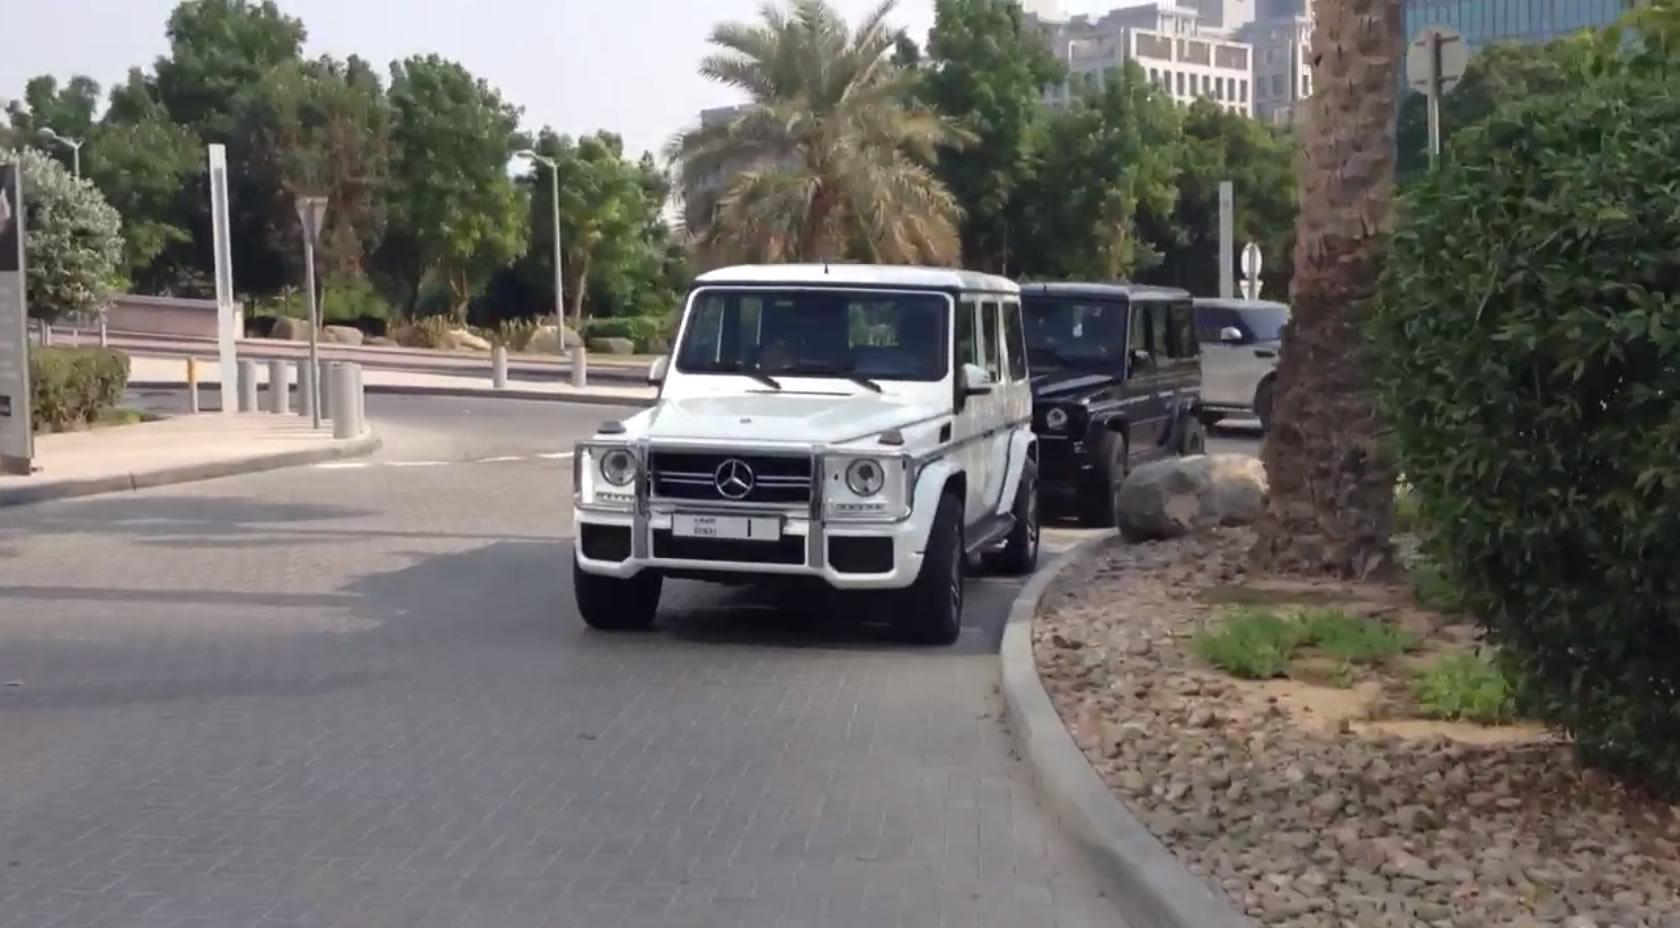 g63 Sheikh Mohammed bin Rashid Al Maktoum Featuring Sheikh Mohammed bin Rashid Al Maktoum's Pack of G63's